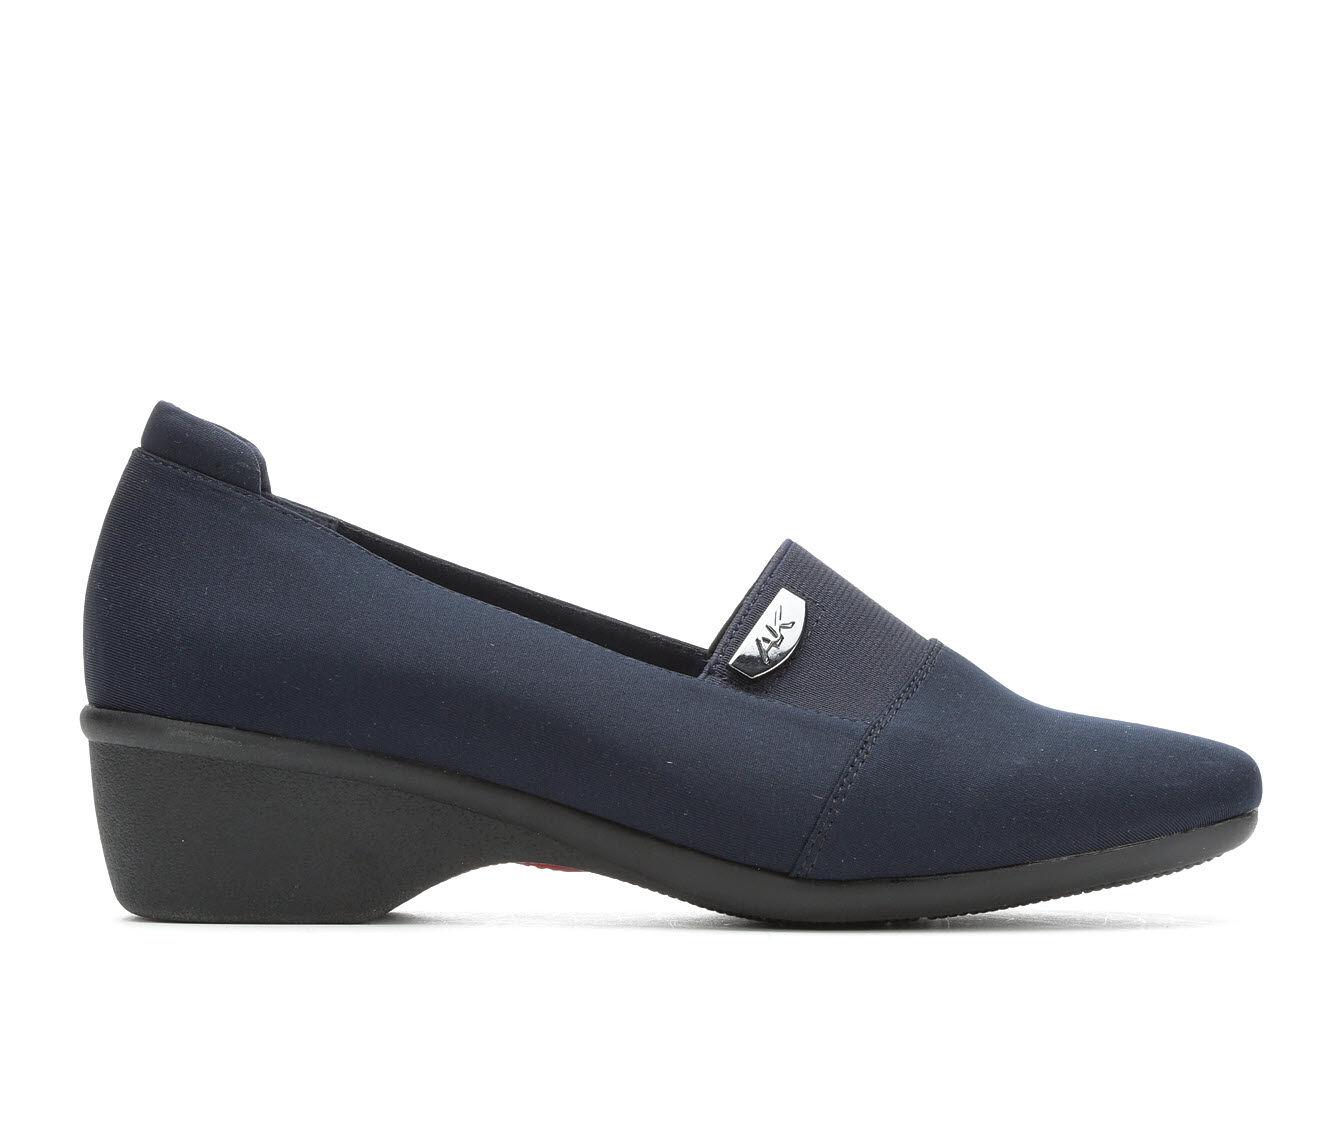 purchase comfortable Women's Anne Klein Sport Wallas Shoes Navy